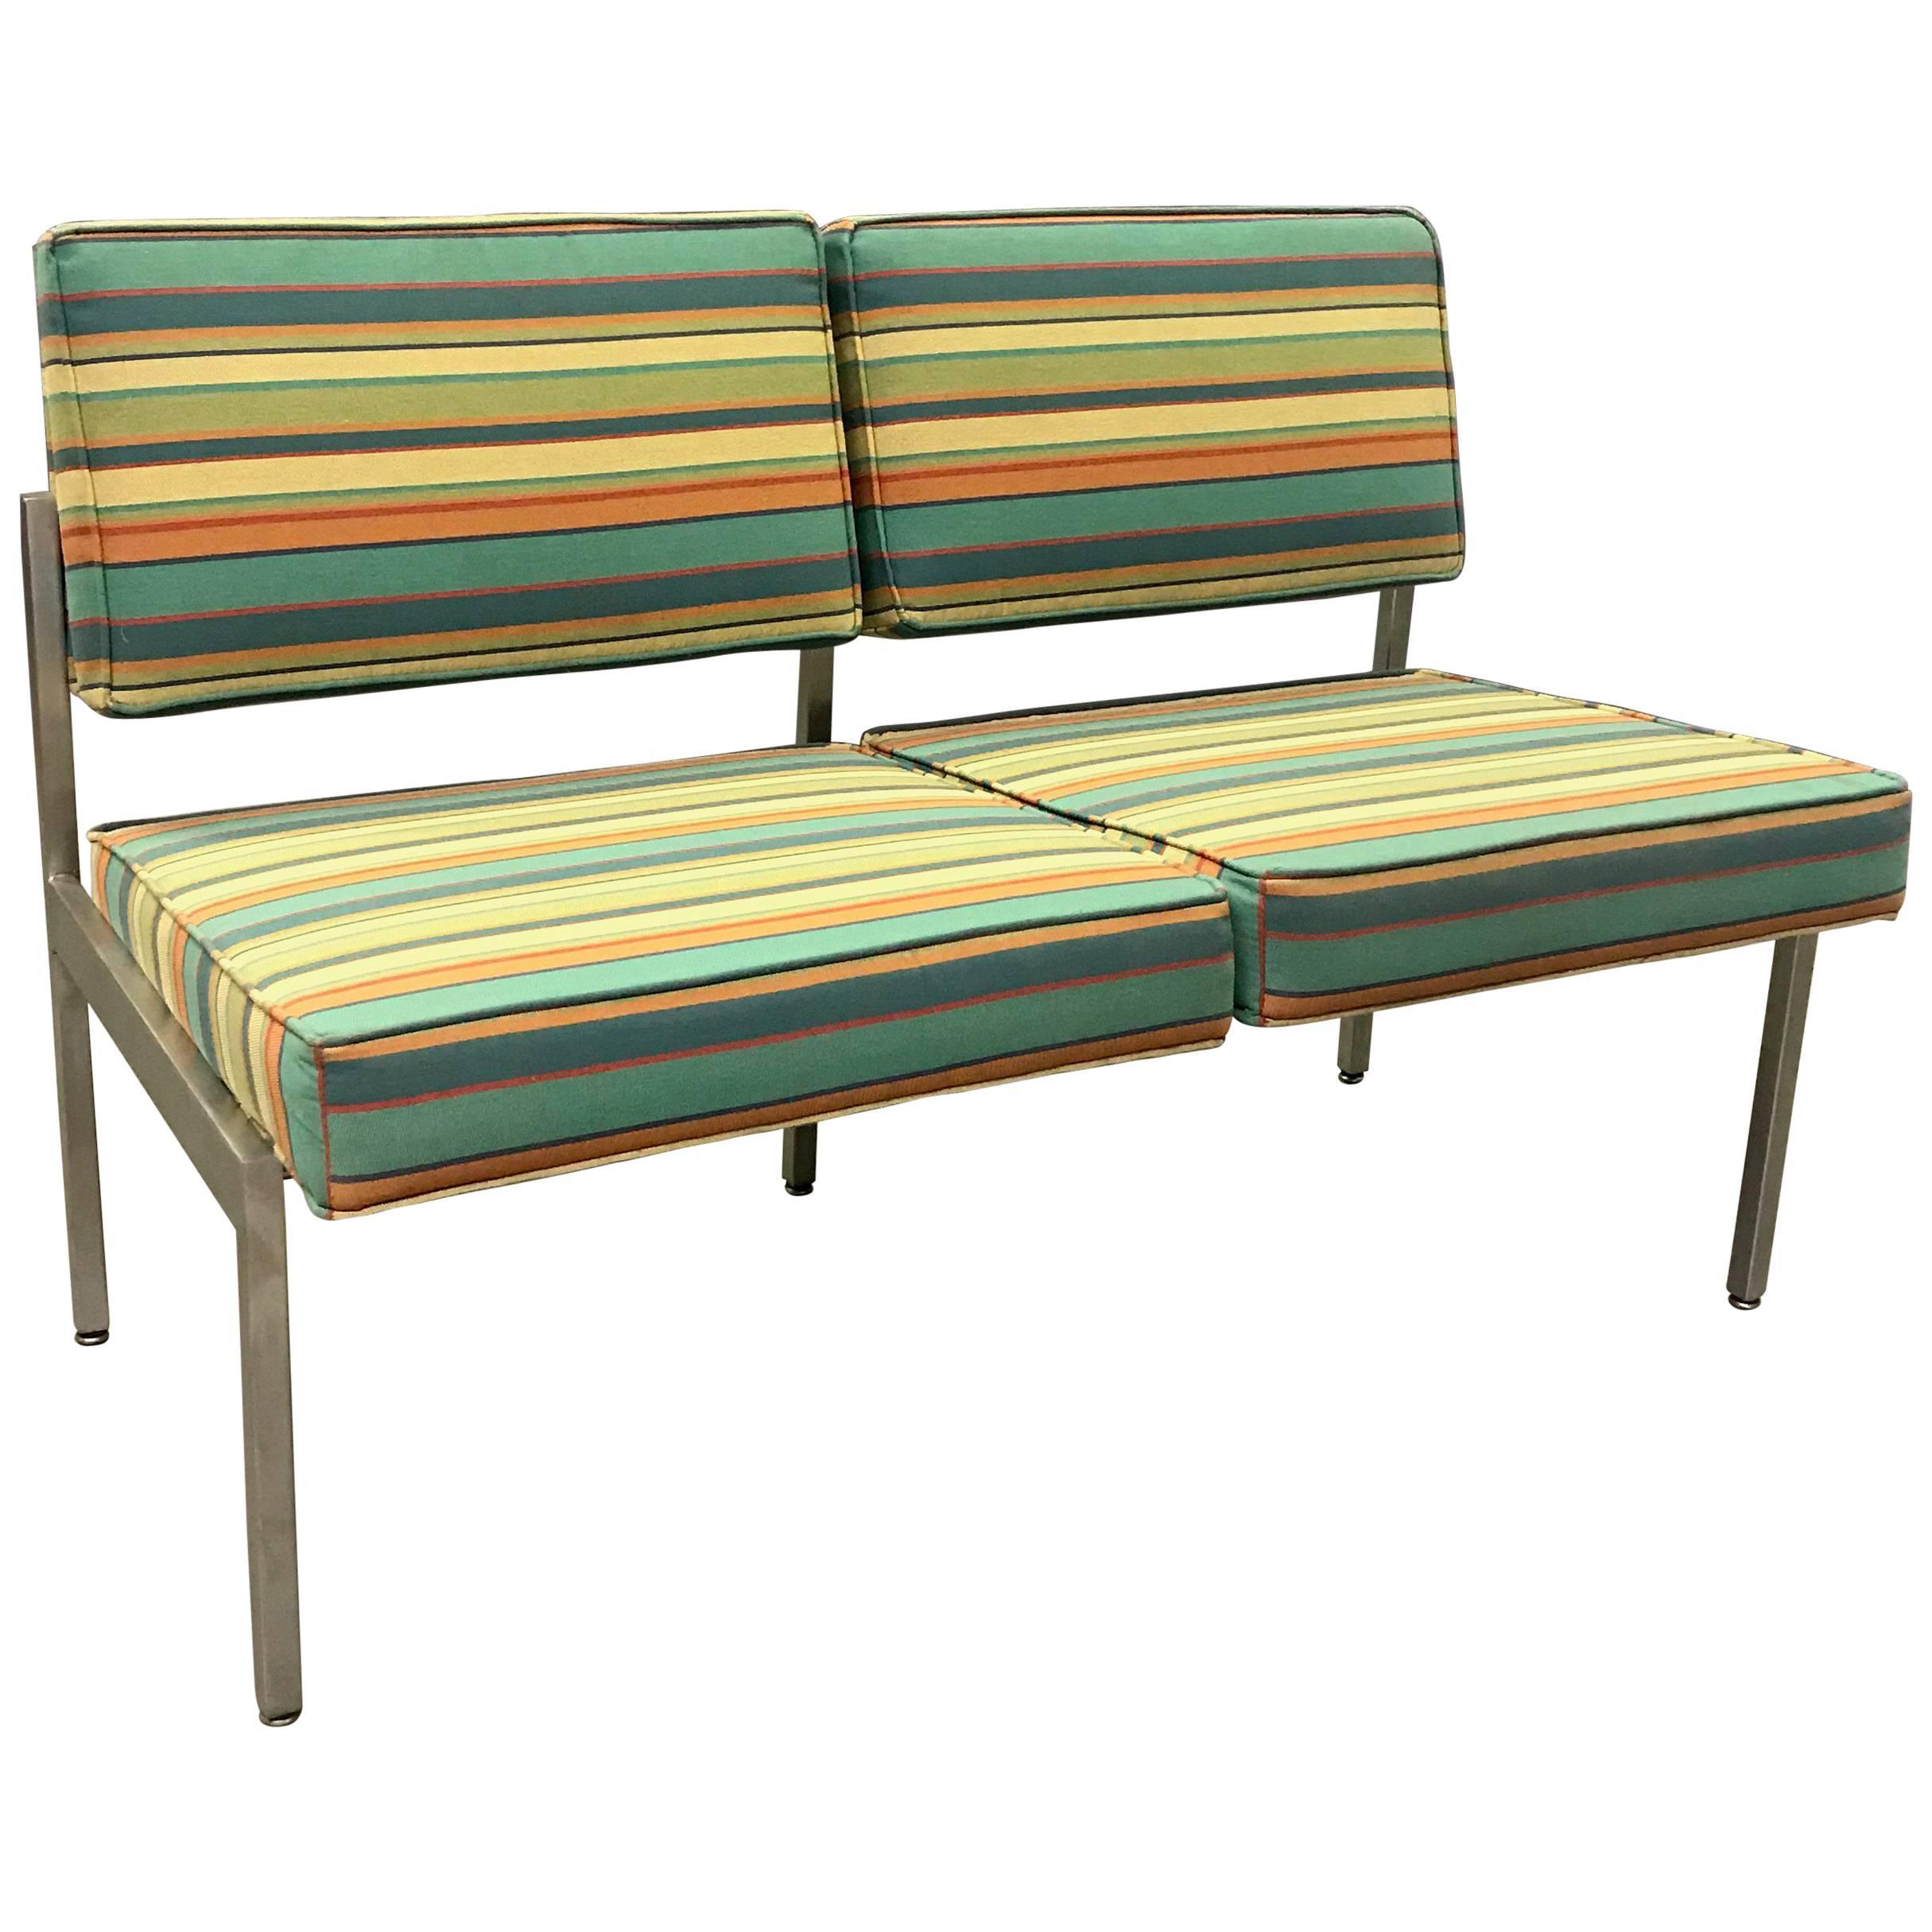 midcentury modern steelcase loveseat sofa